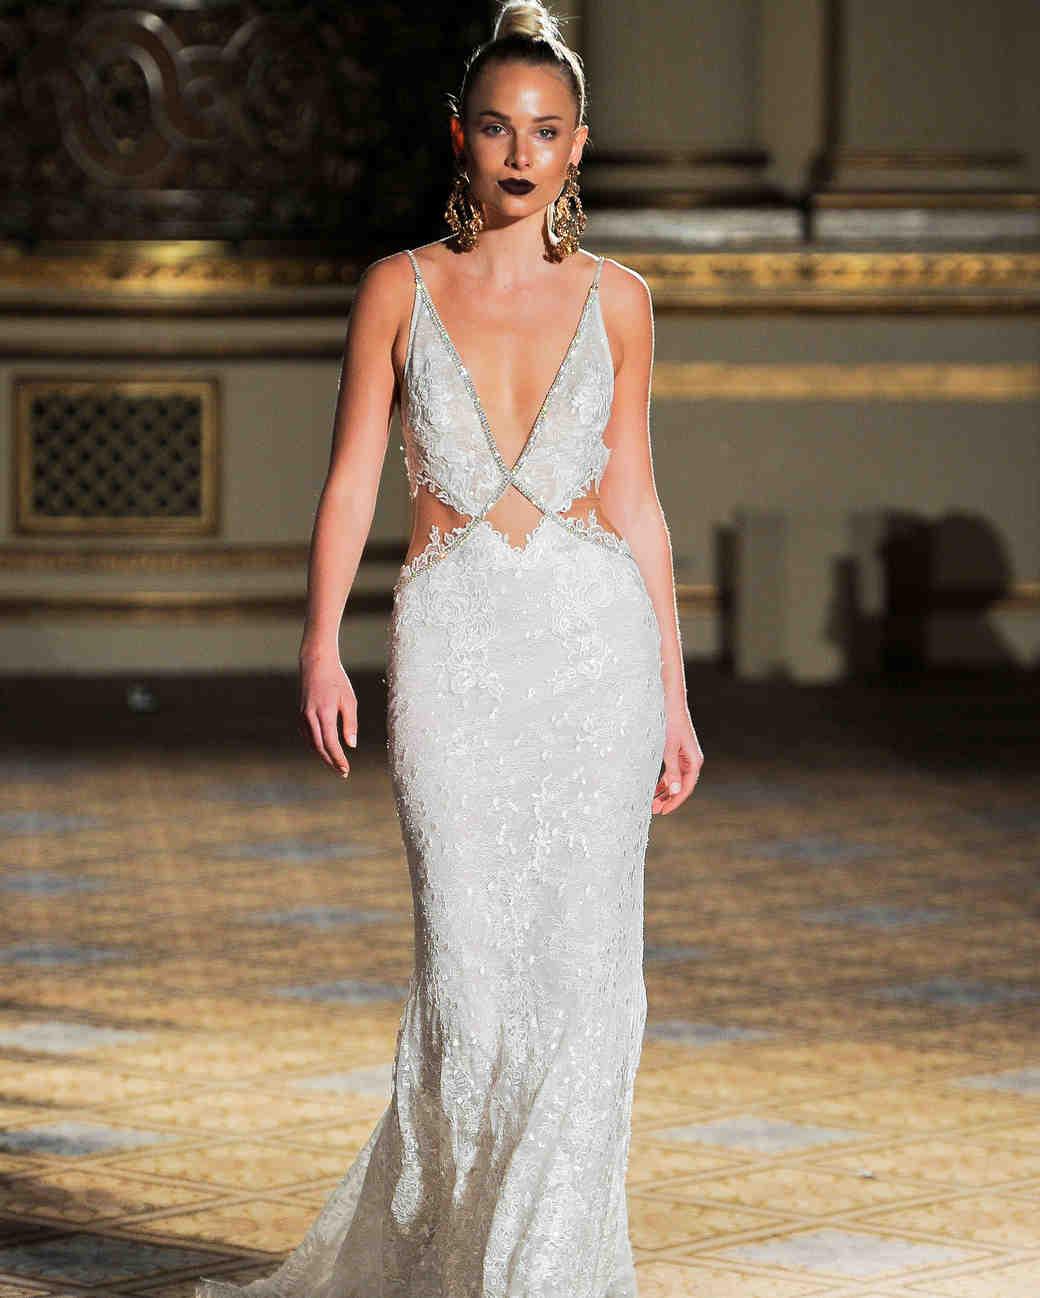 Out Wedding Dress